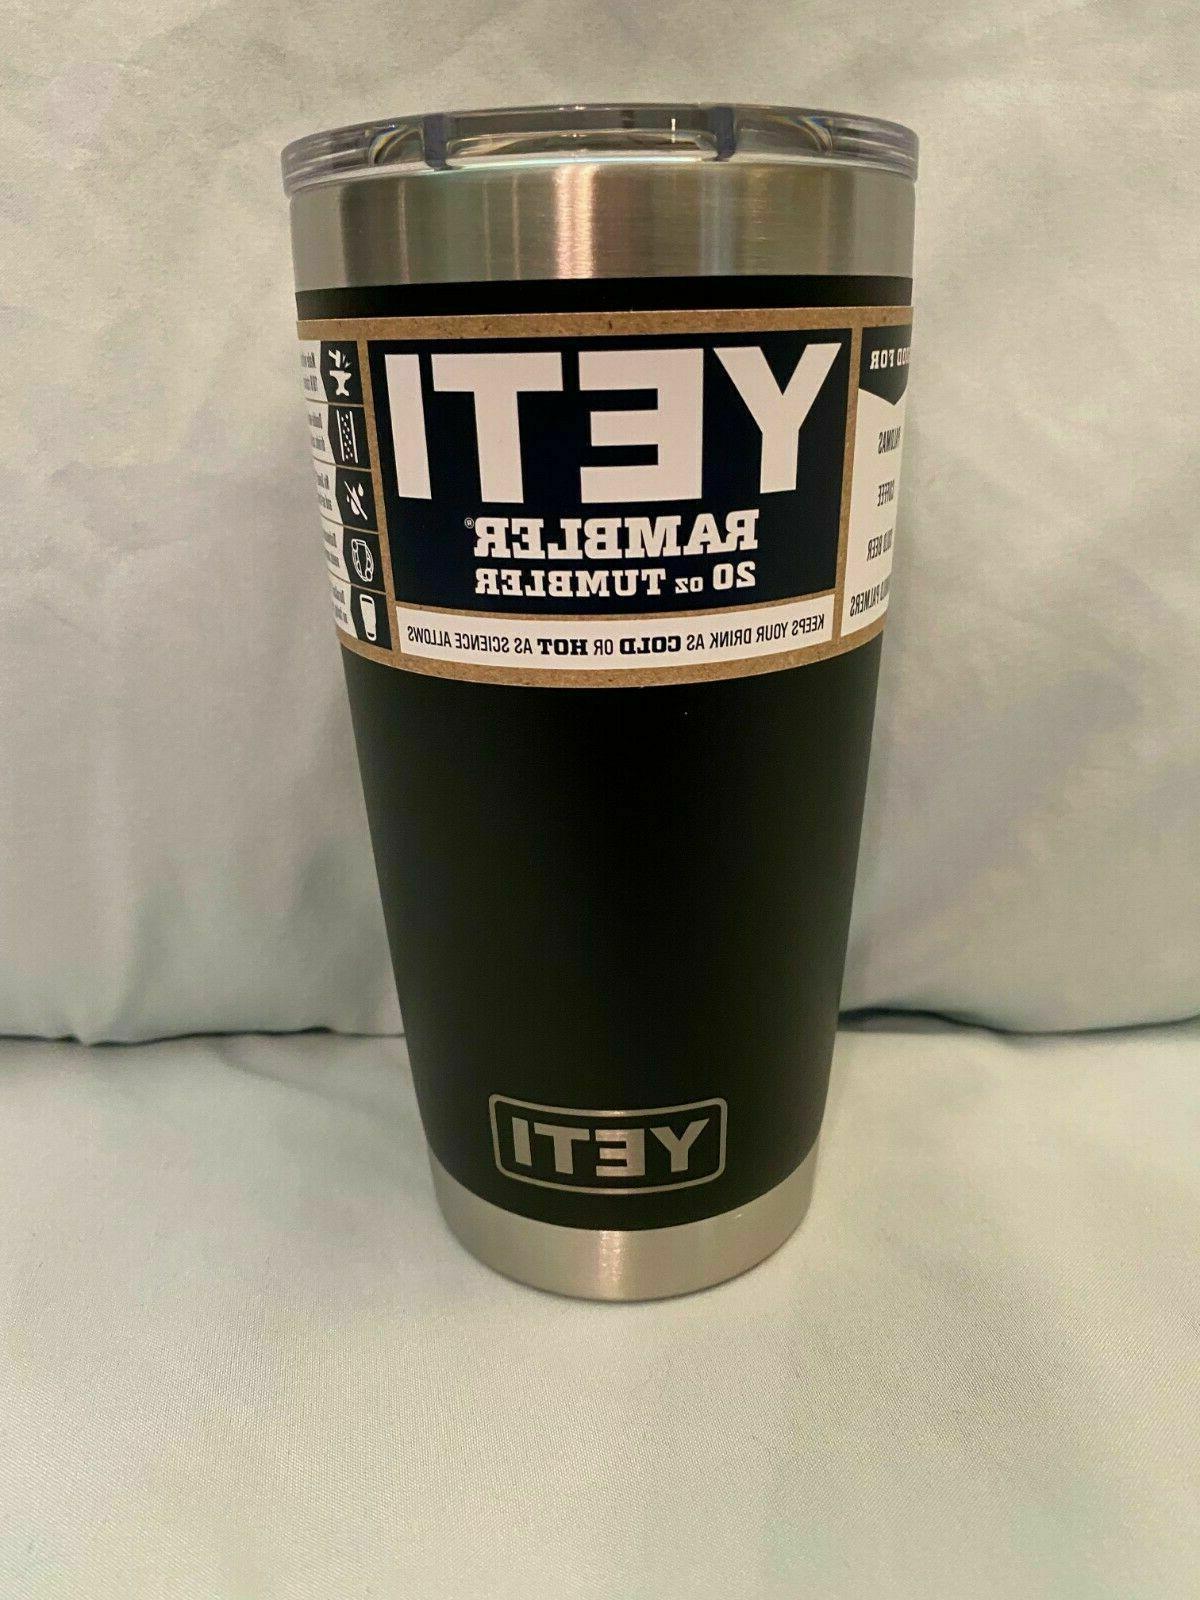 NEW Yeti Rambler 20 oz Black Cup Insulated Tumbler with Tran